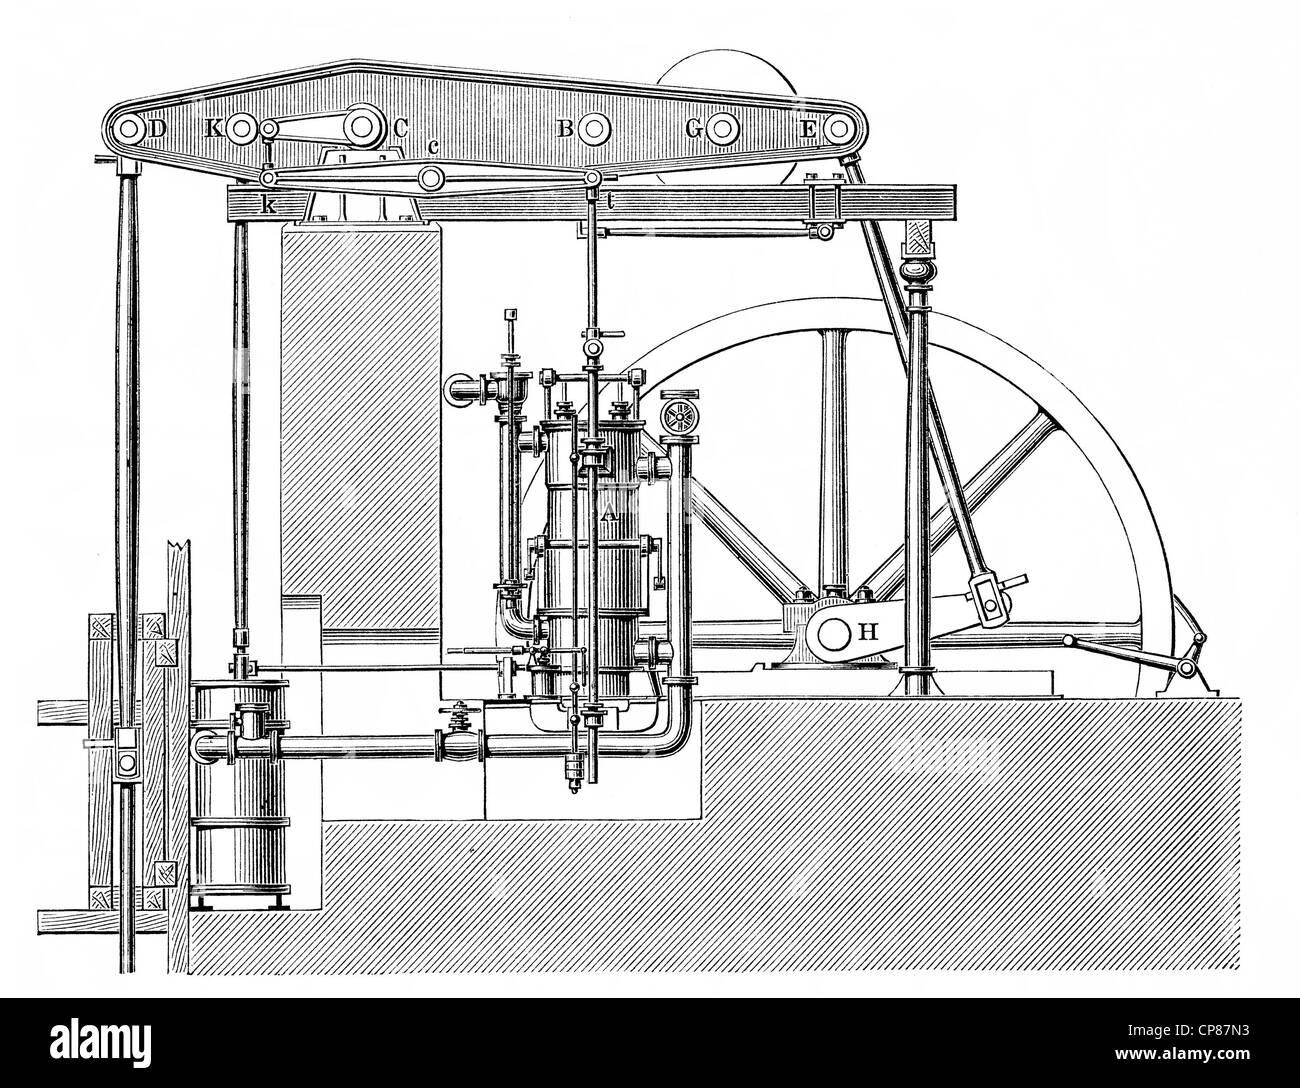 basic steam engine diagram range rover 2004 engine diagram